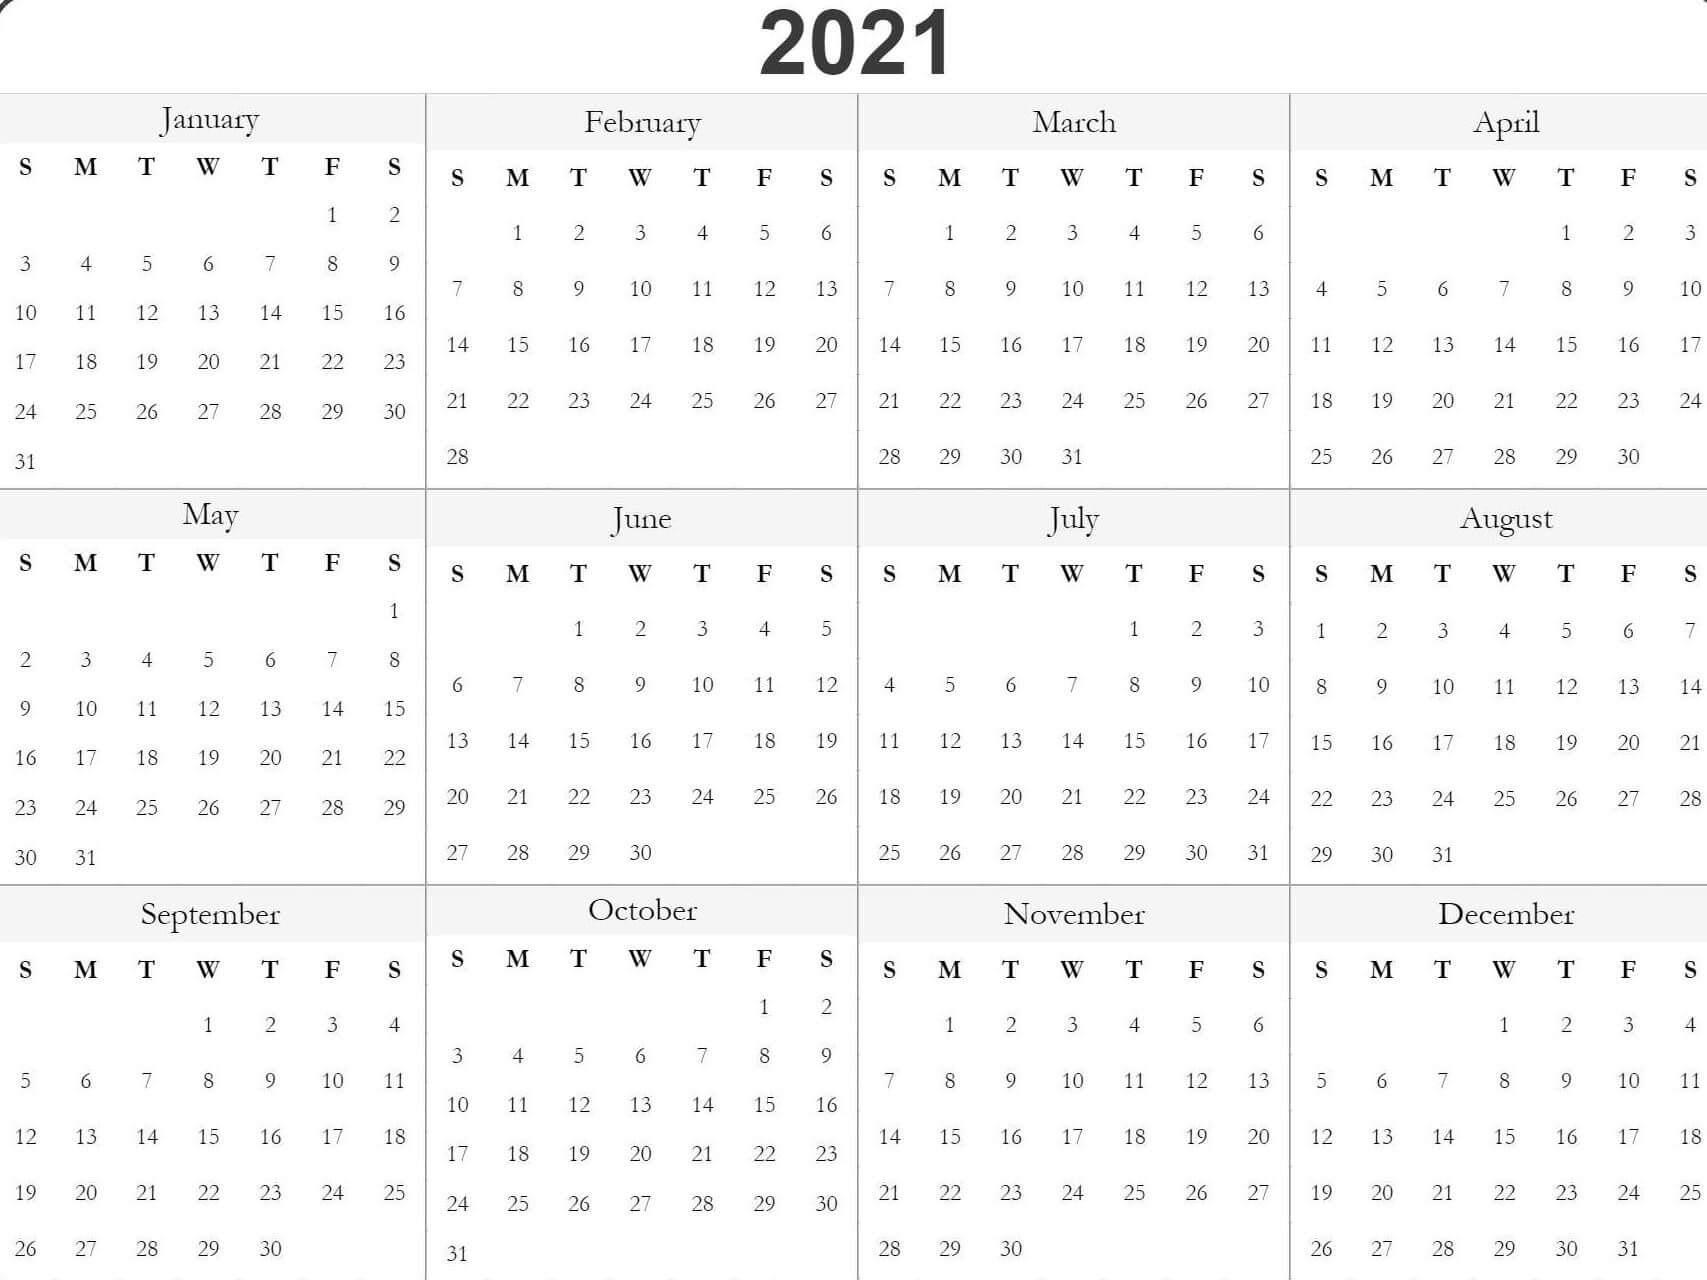 2021 Calendar Template Pdf, Word, Excel Free Download